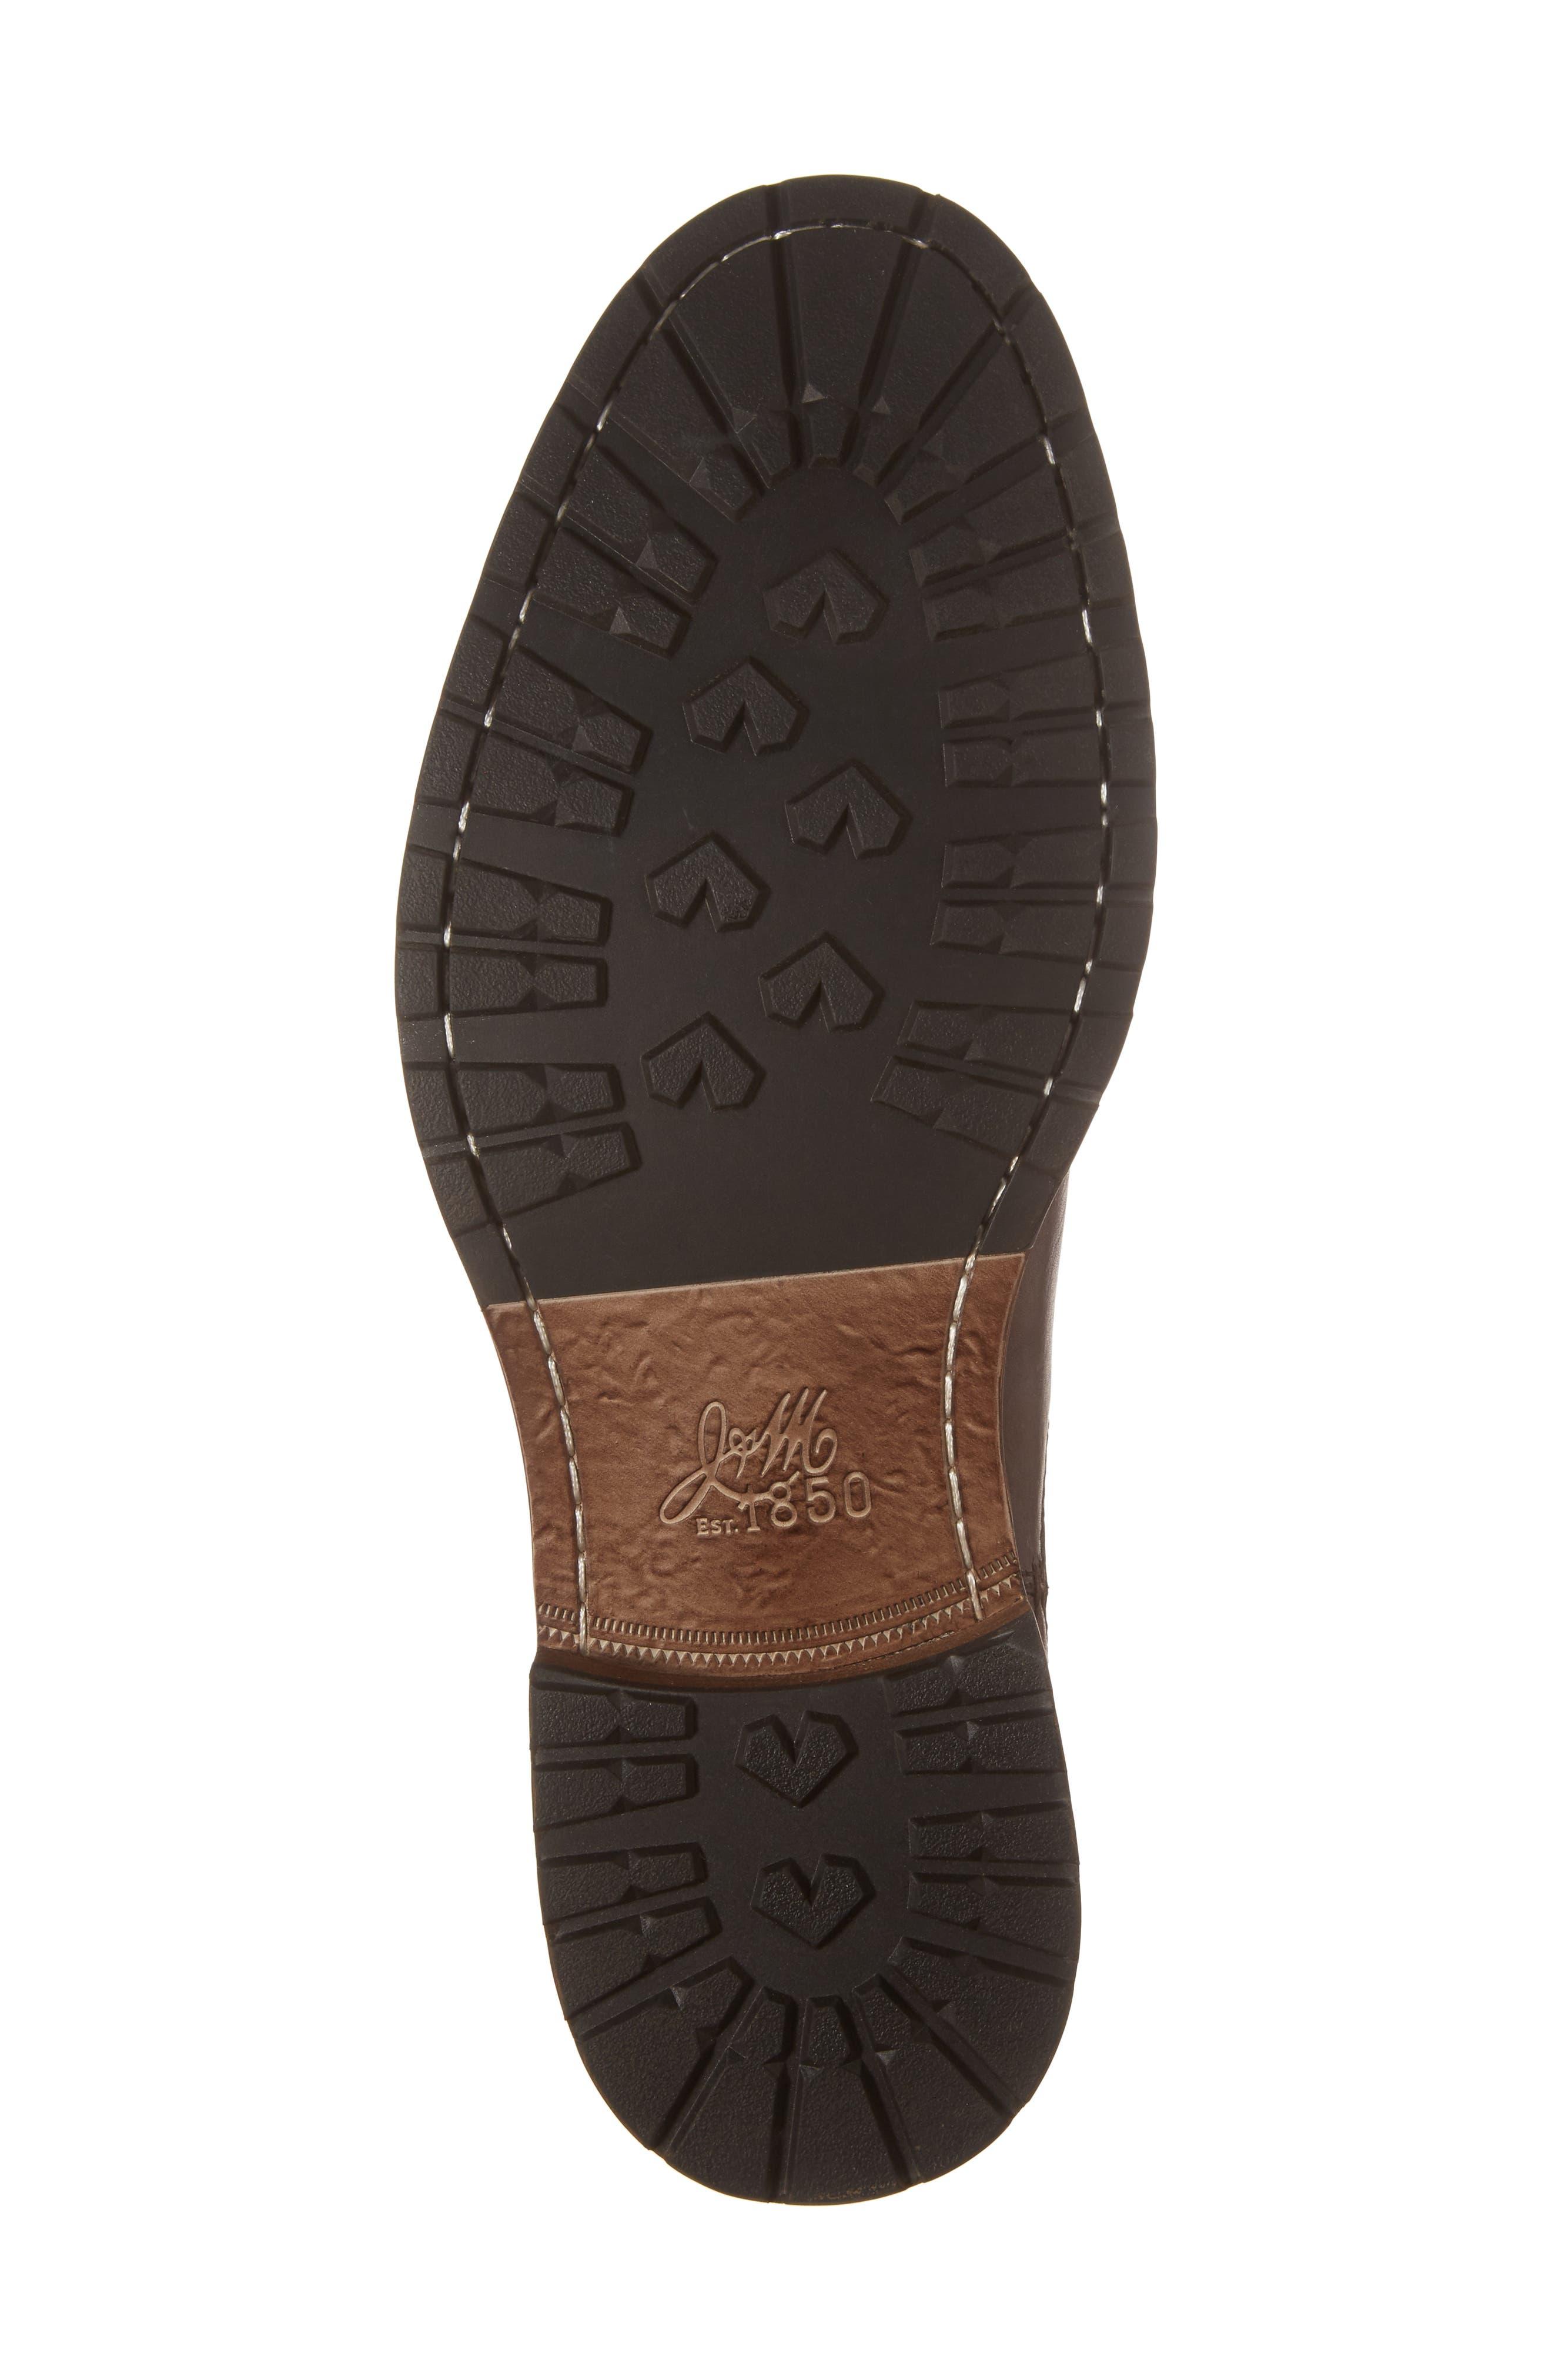 Myles Chelsea Boot,                             Alternate thumbnail 6, color,                             Mahogany Leather